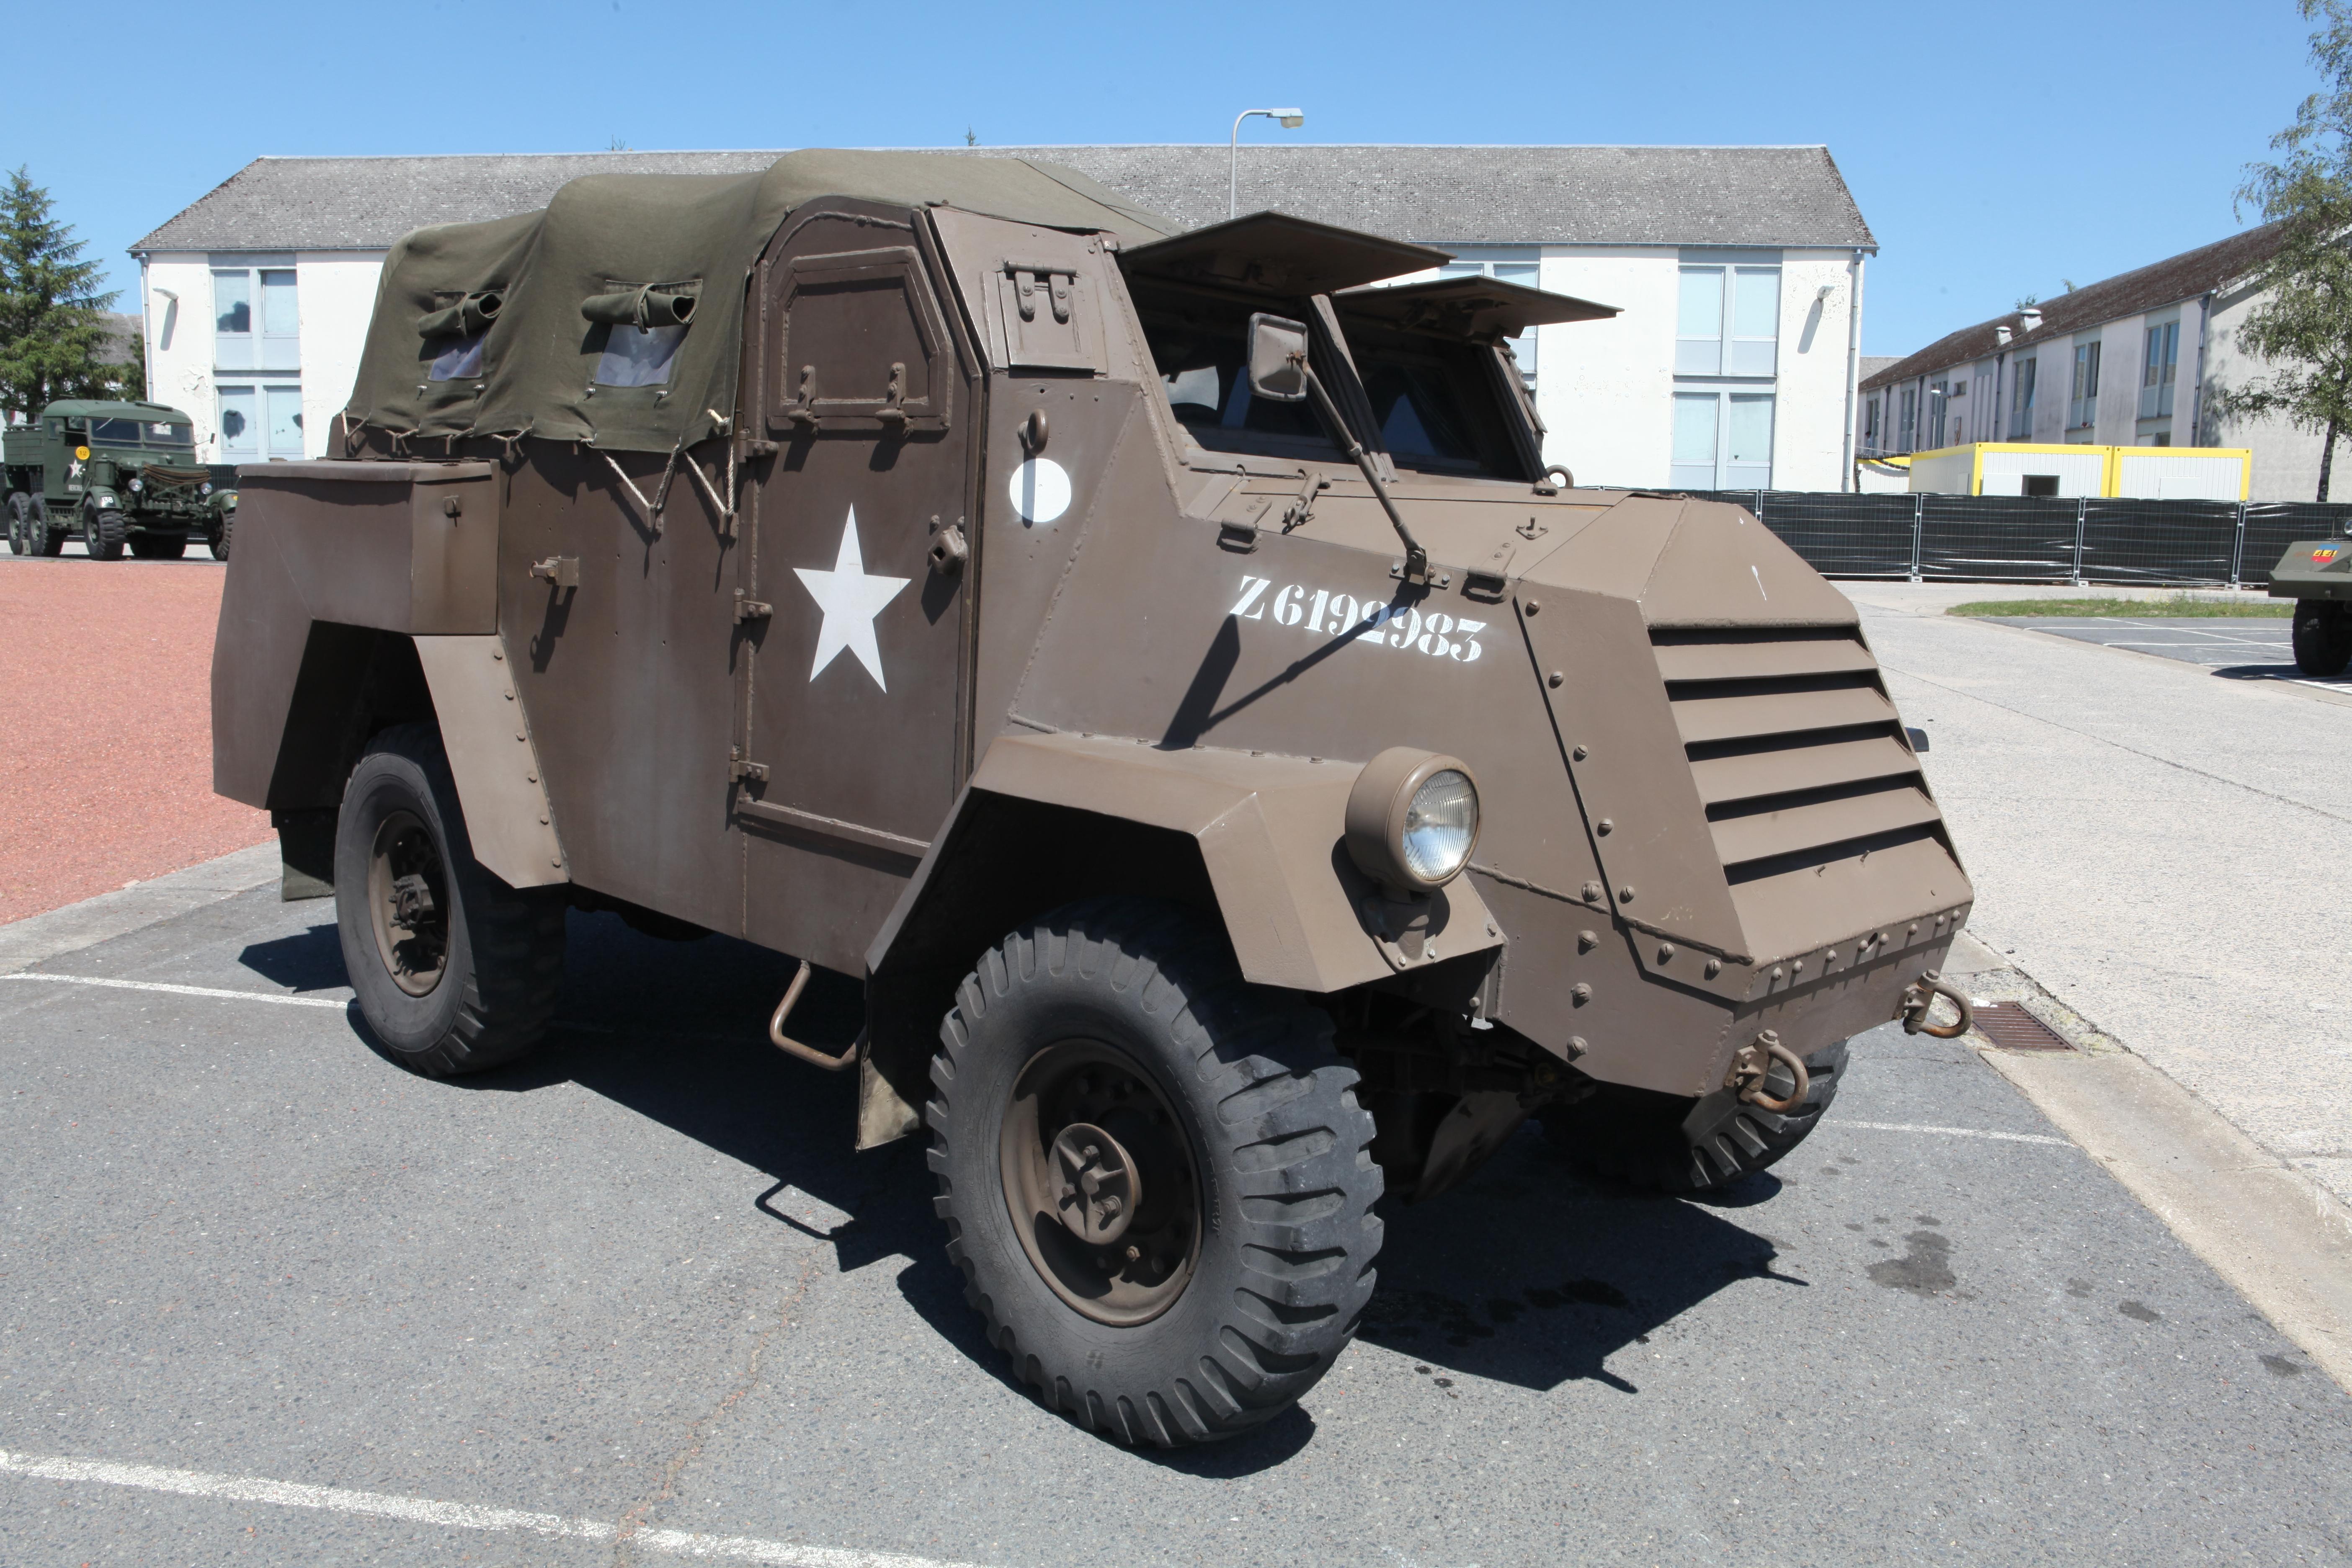 FileC15TA Armoured Truckjpg Wikimedia Commons